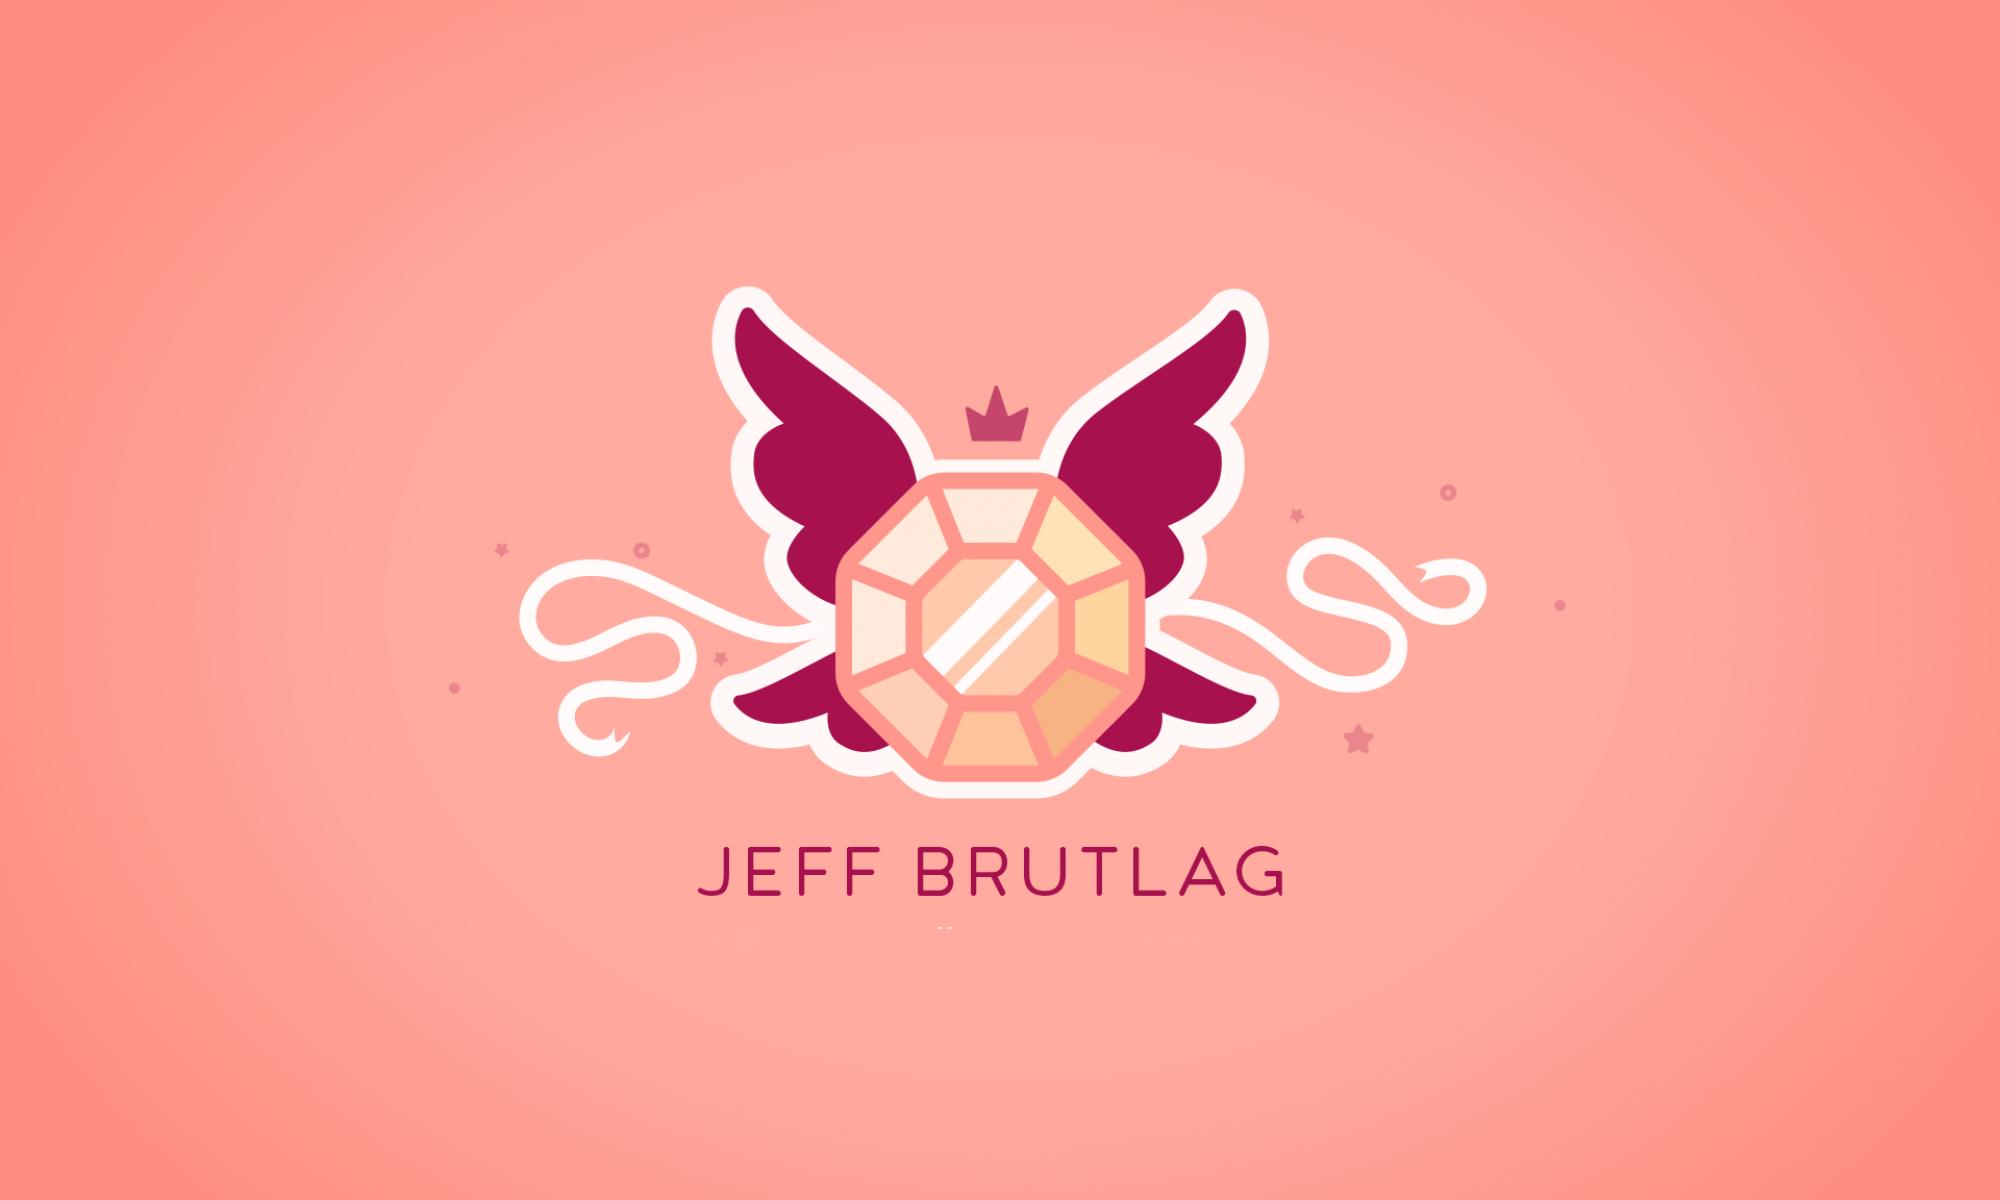 Jeff Brutlag